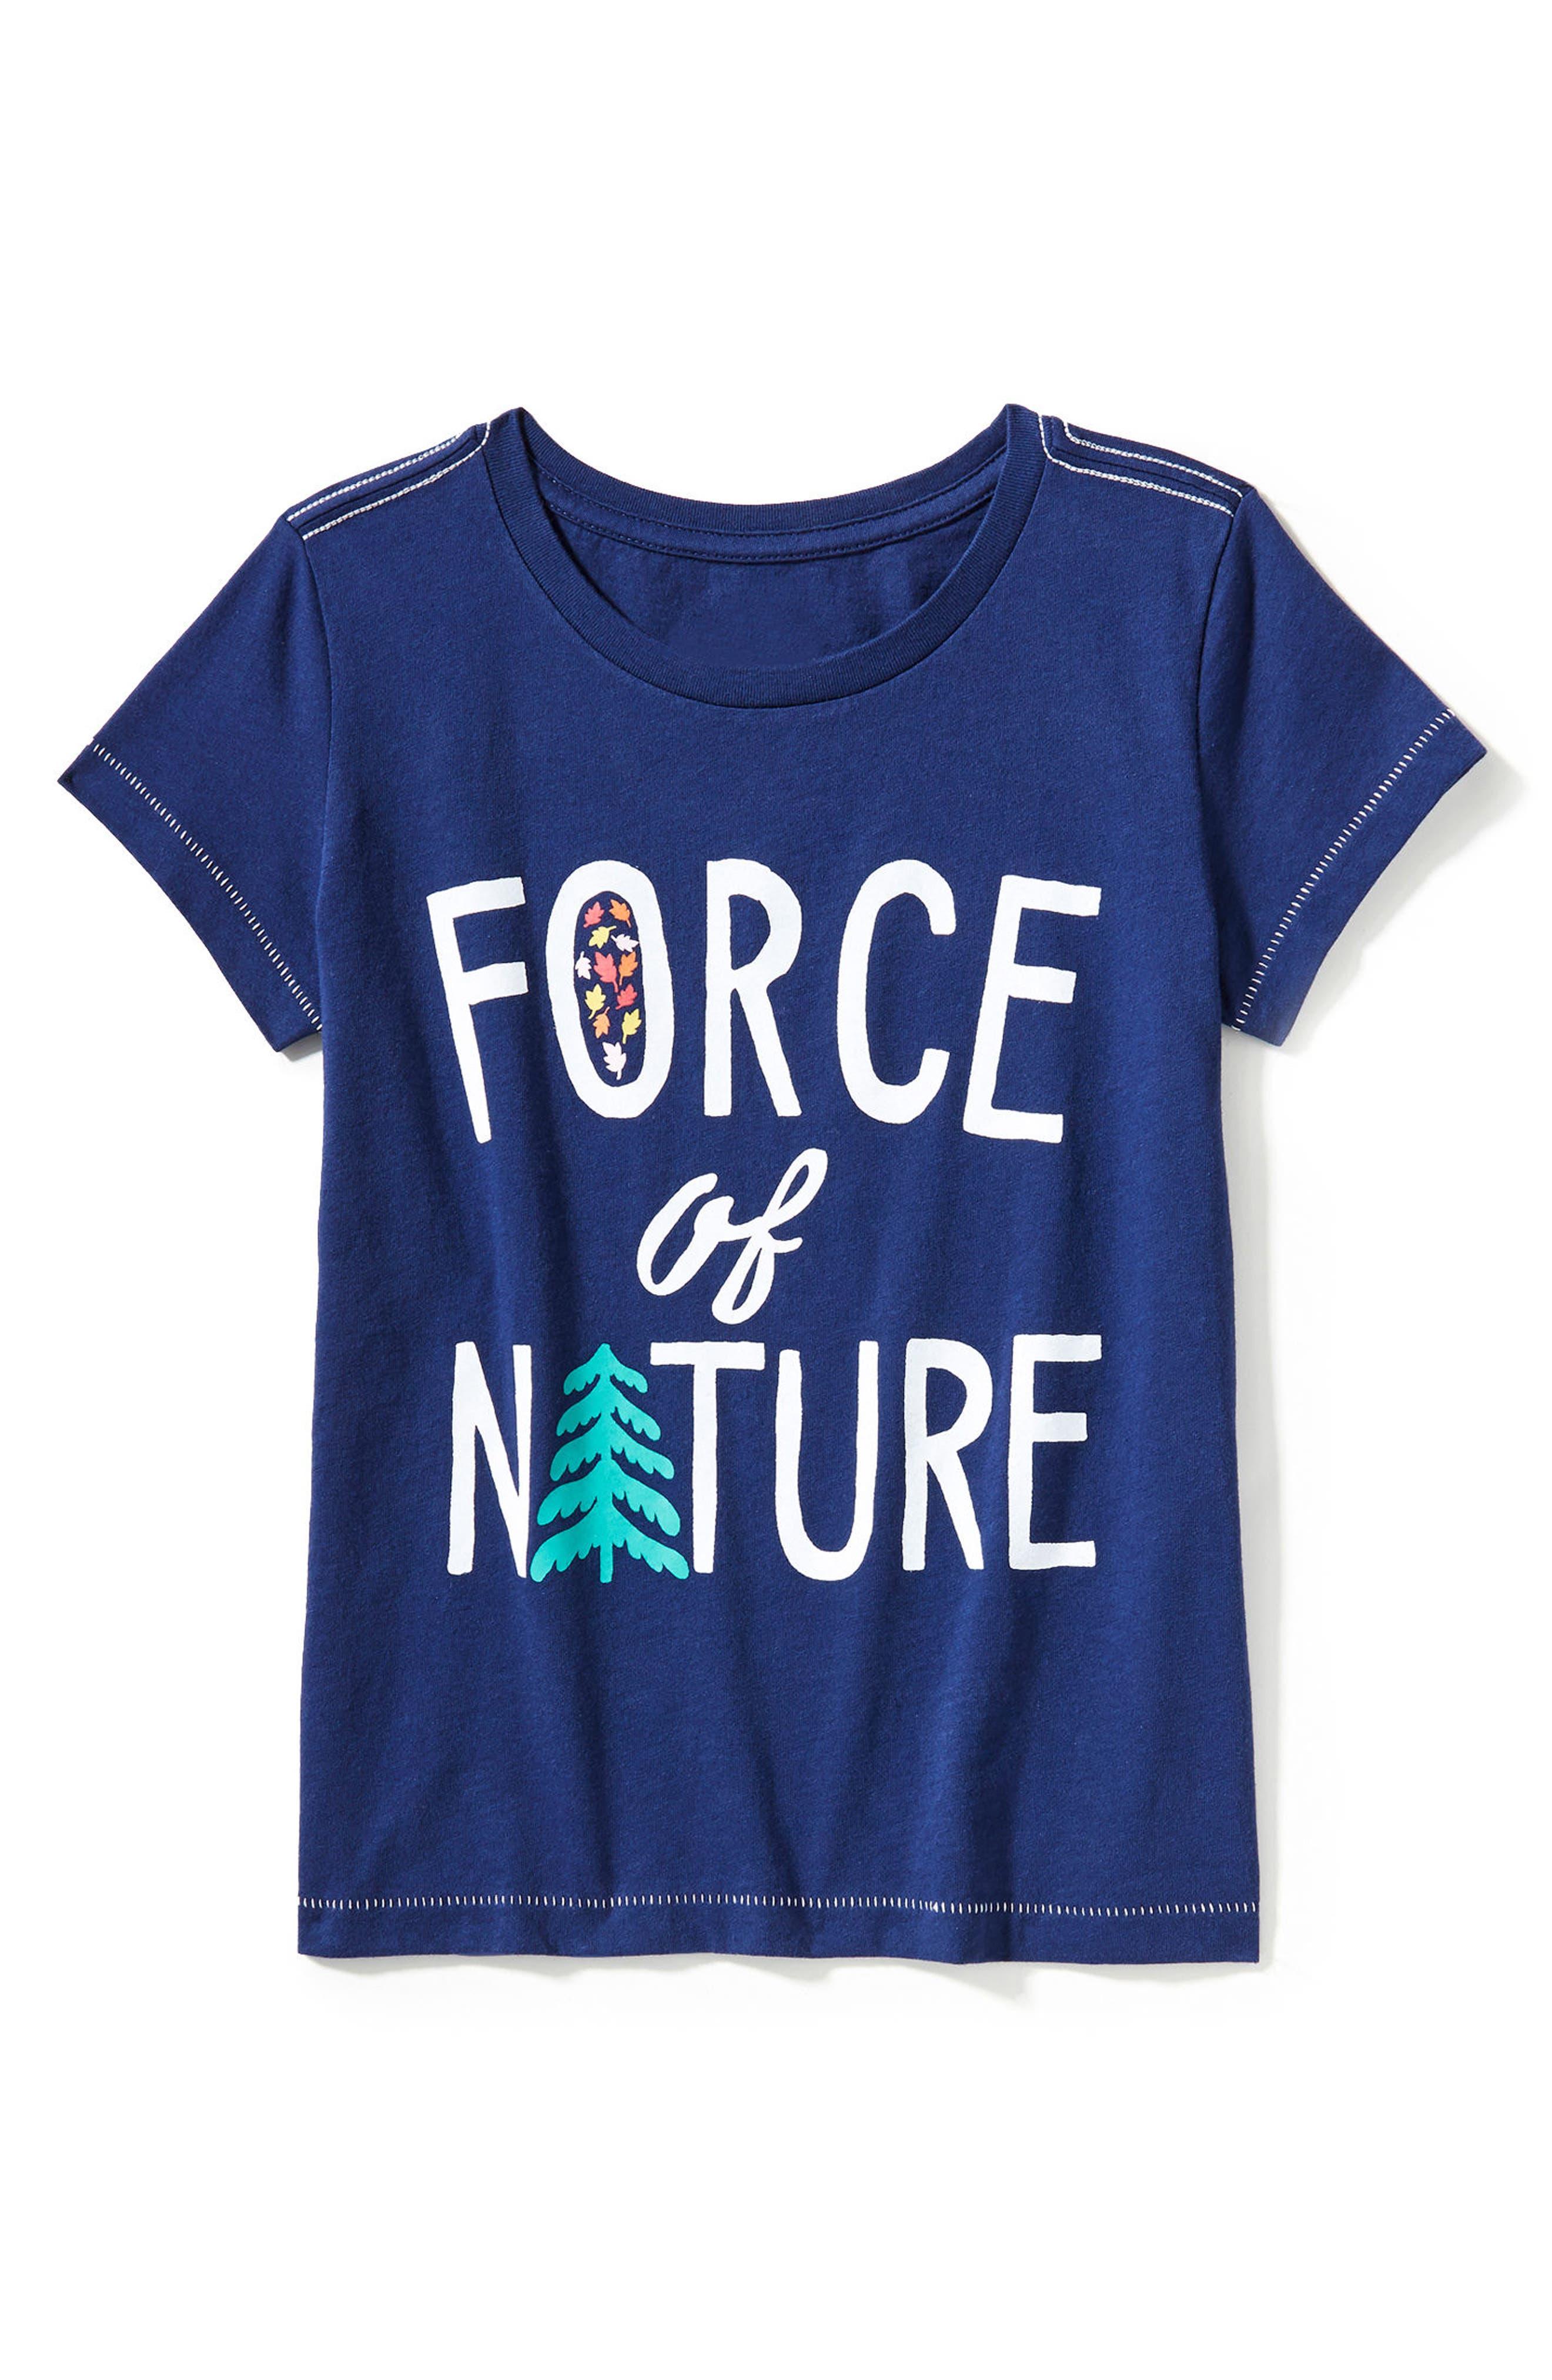 Peek Force of Nature Graphic Tee (Toddler Girls, Little Girls & Big Girls)